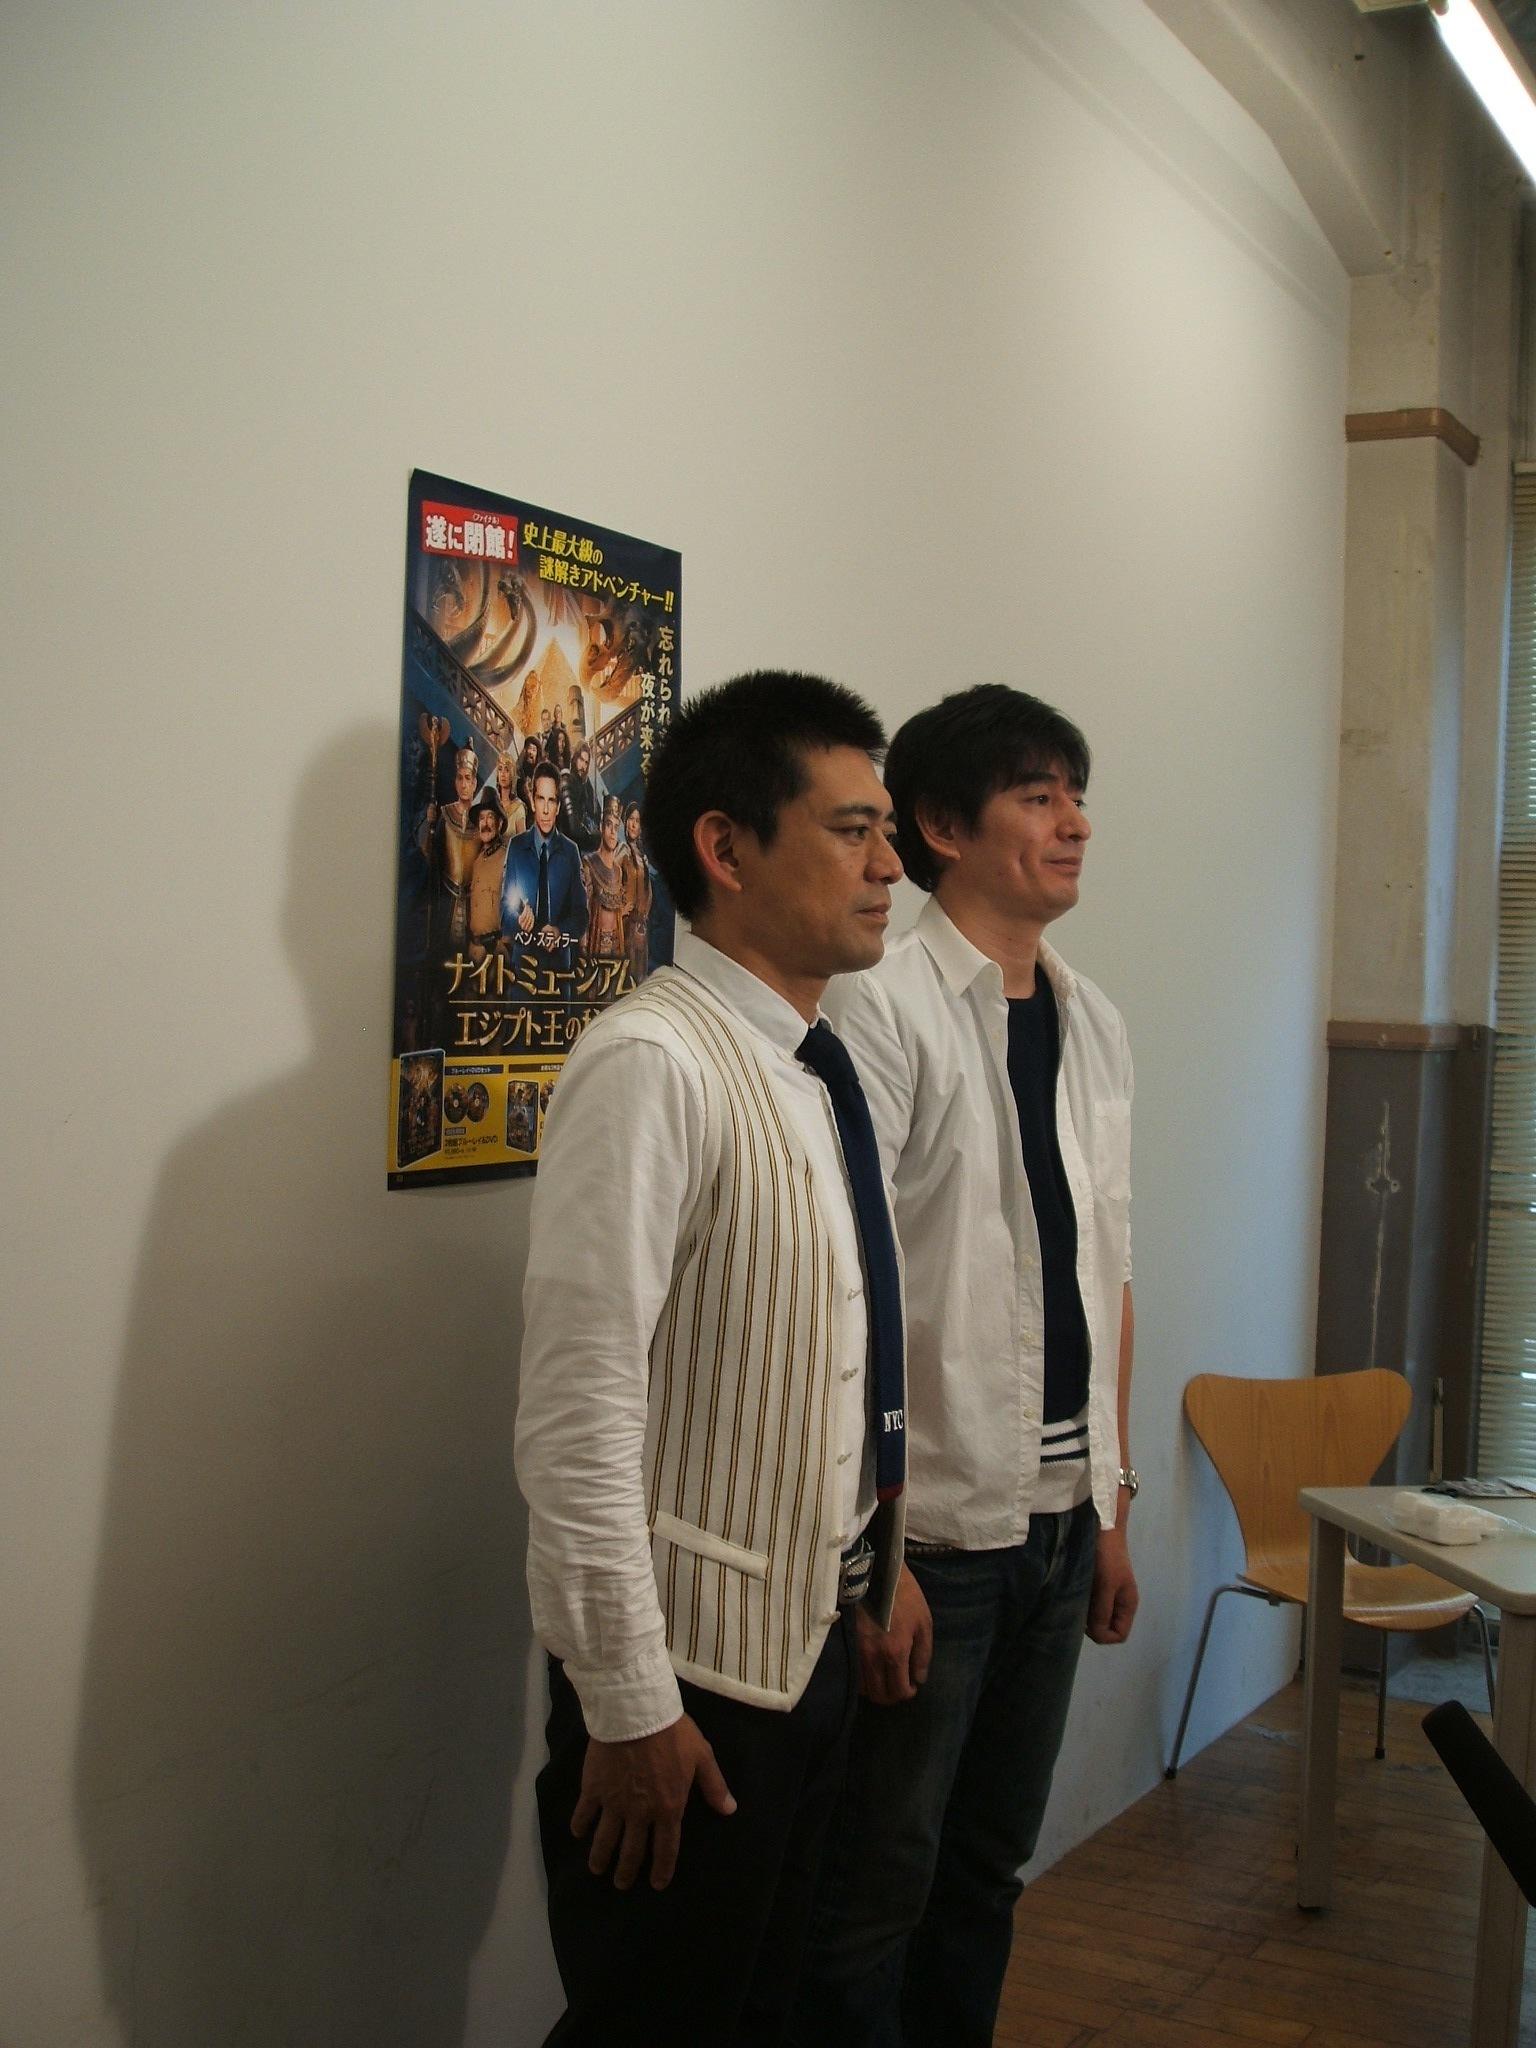 http://news.yoshimoto.co.jp/photos/uncategorized/2015/05/29/20150529140254-e6e4a3749c8467dde15fc36f7c3f8806534b74a3.jpg